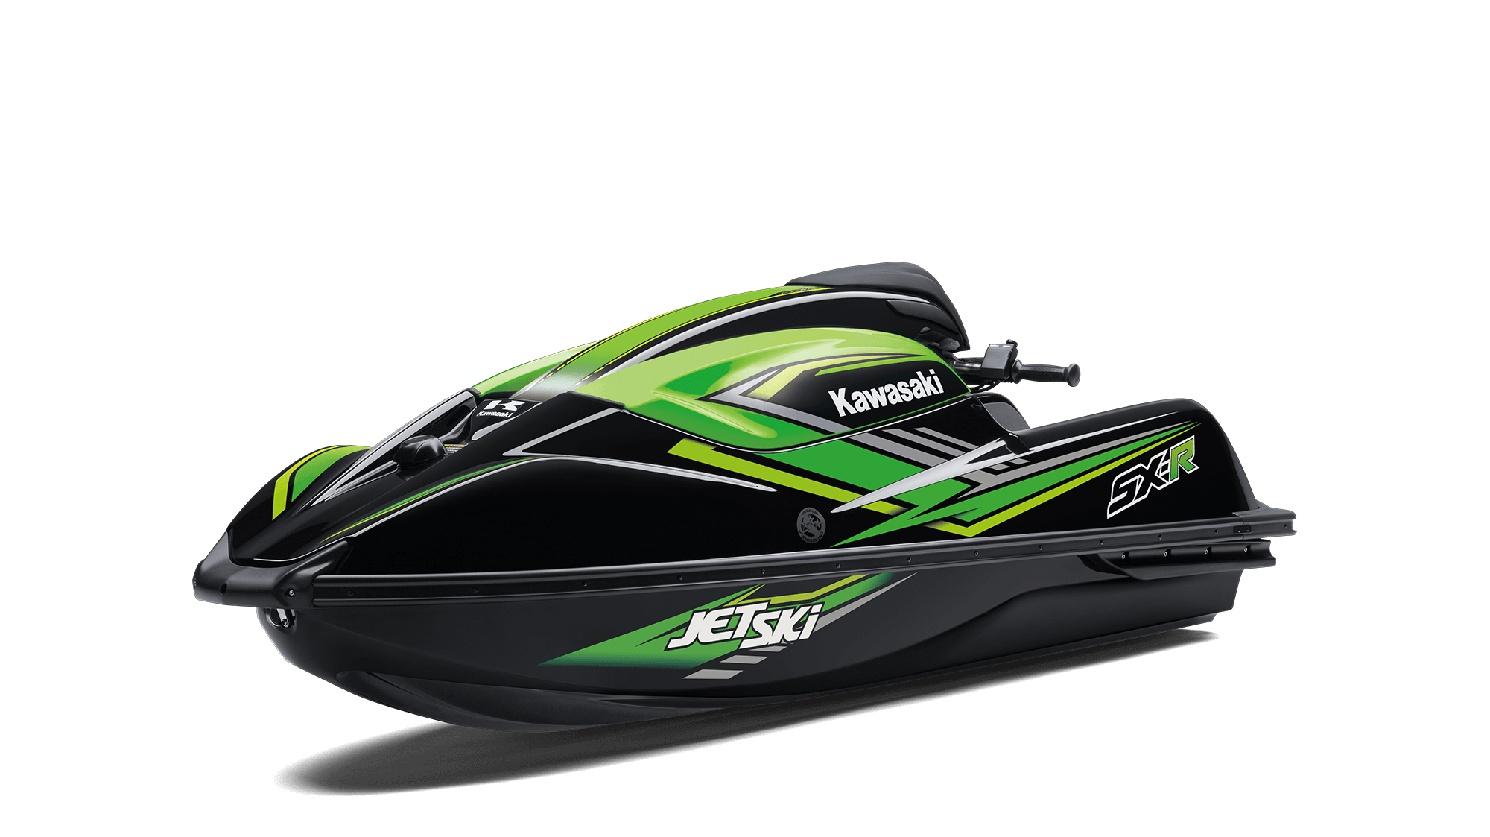 2020 Kawasaki JET SKI SX-R Ebony / Lime Green